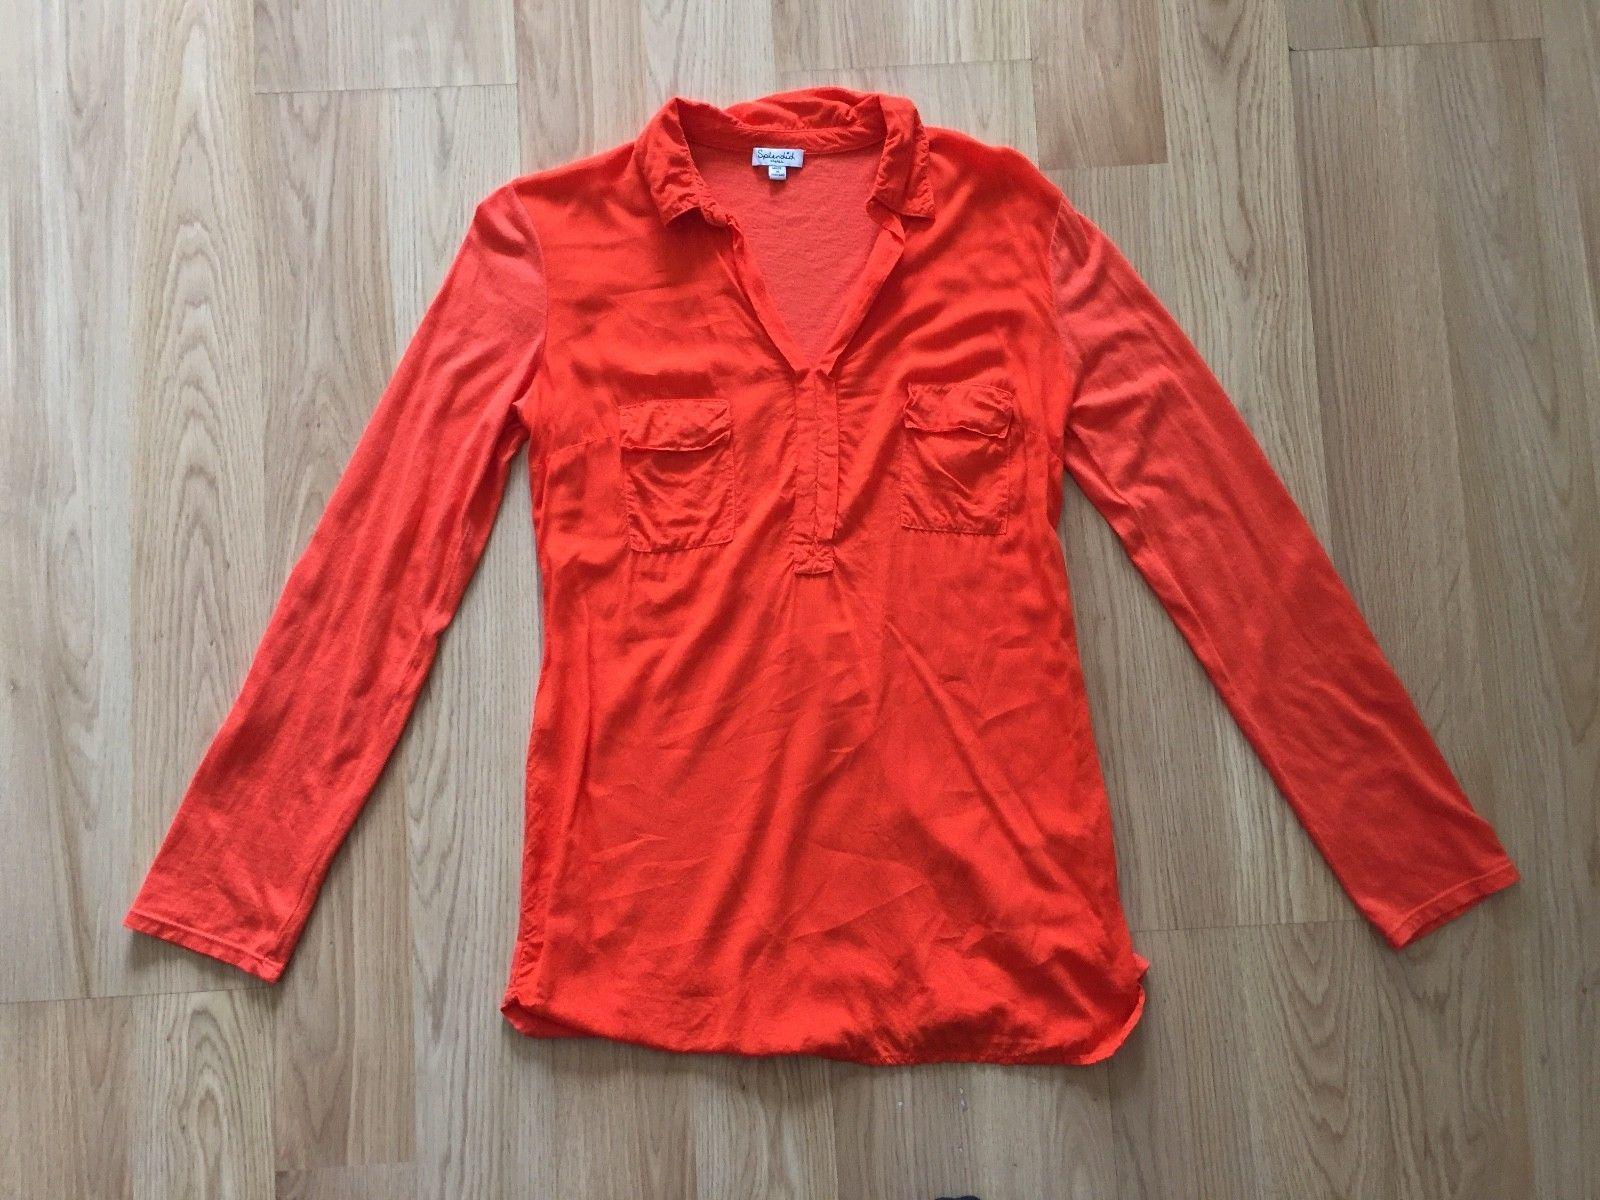 Splendid long sleeve orange top sz S/P